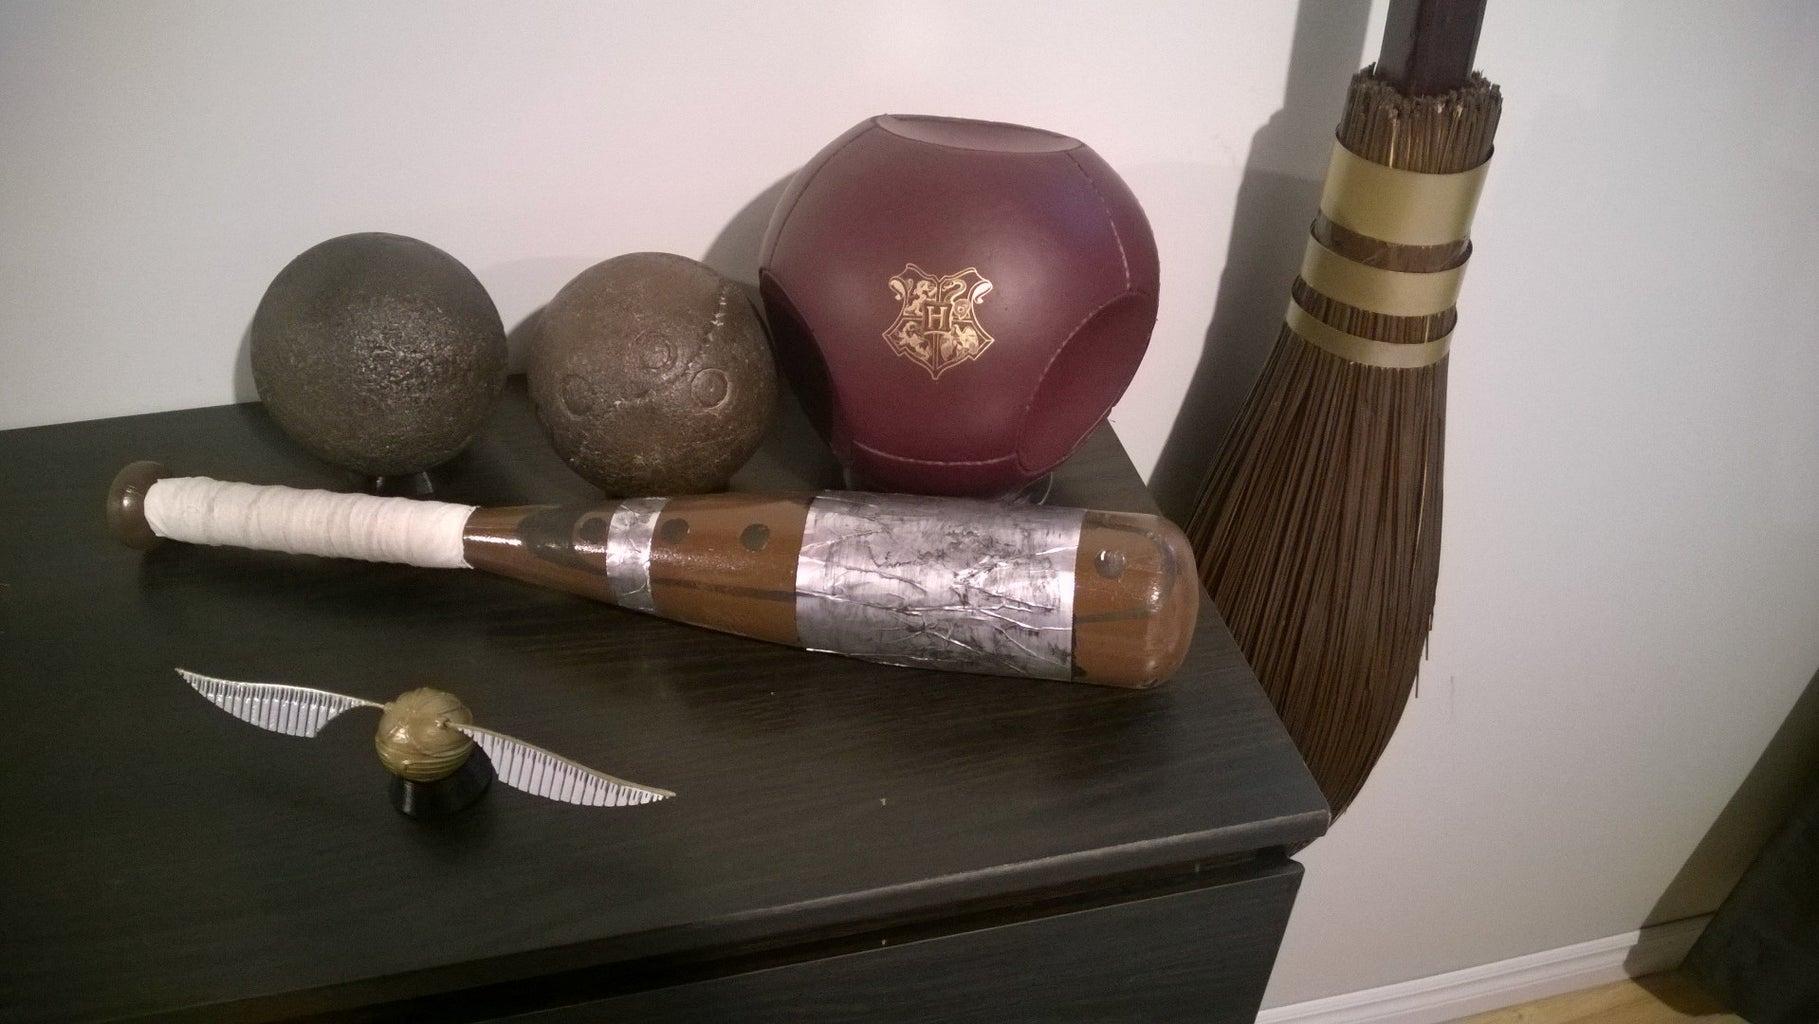 Quidditch Accessories